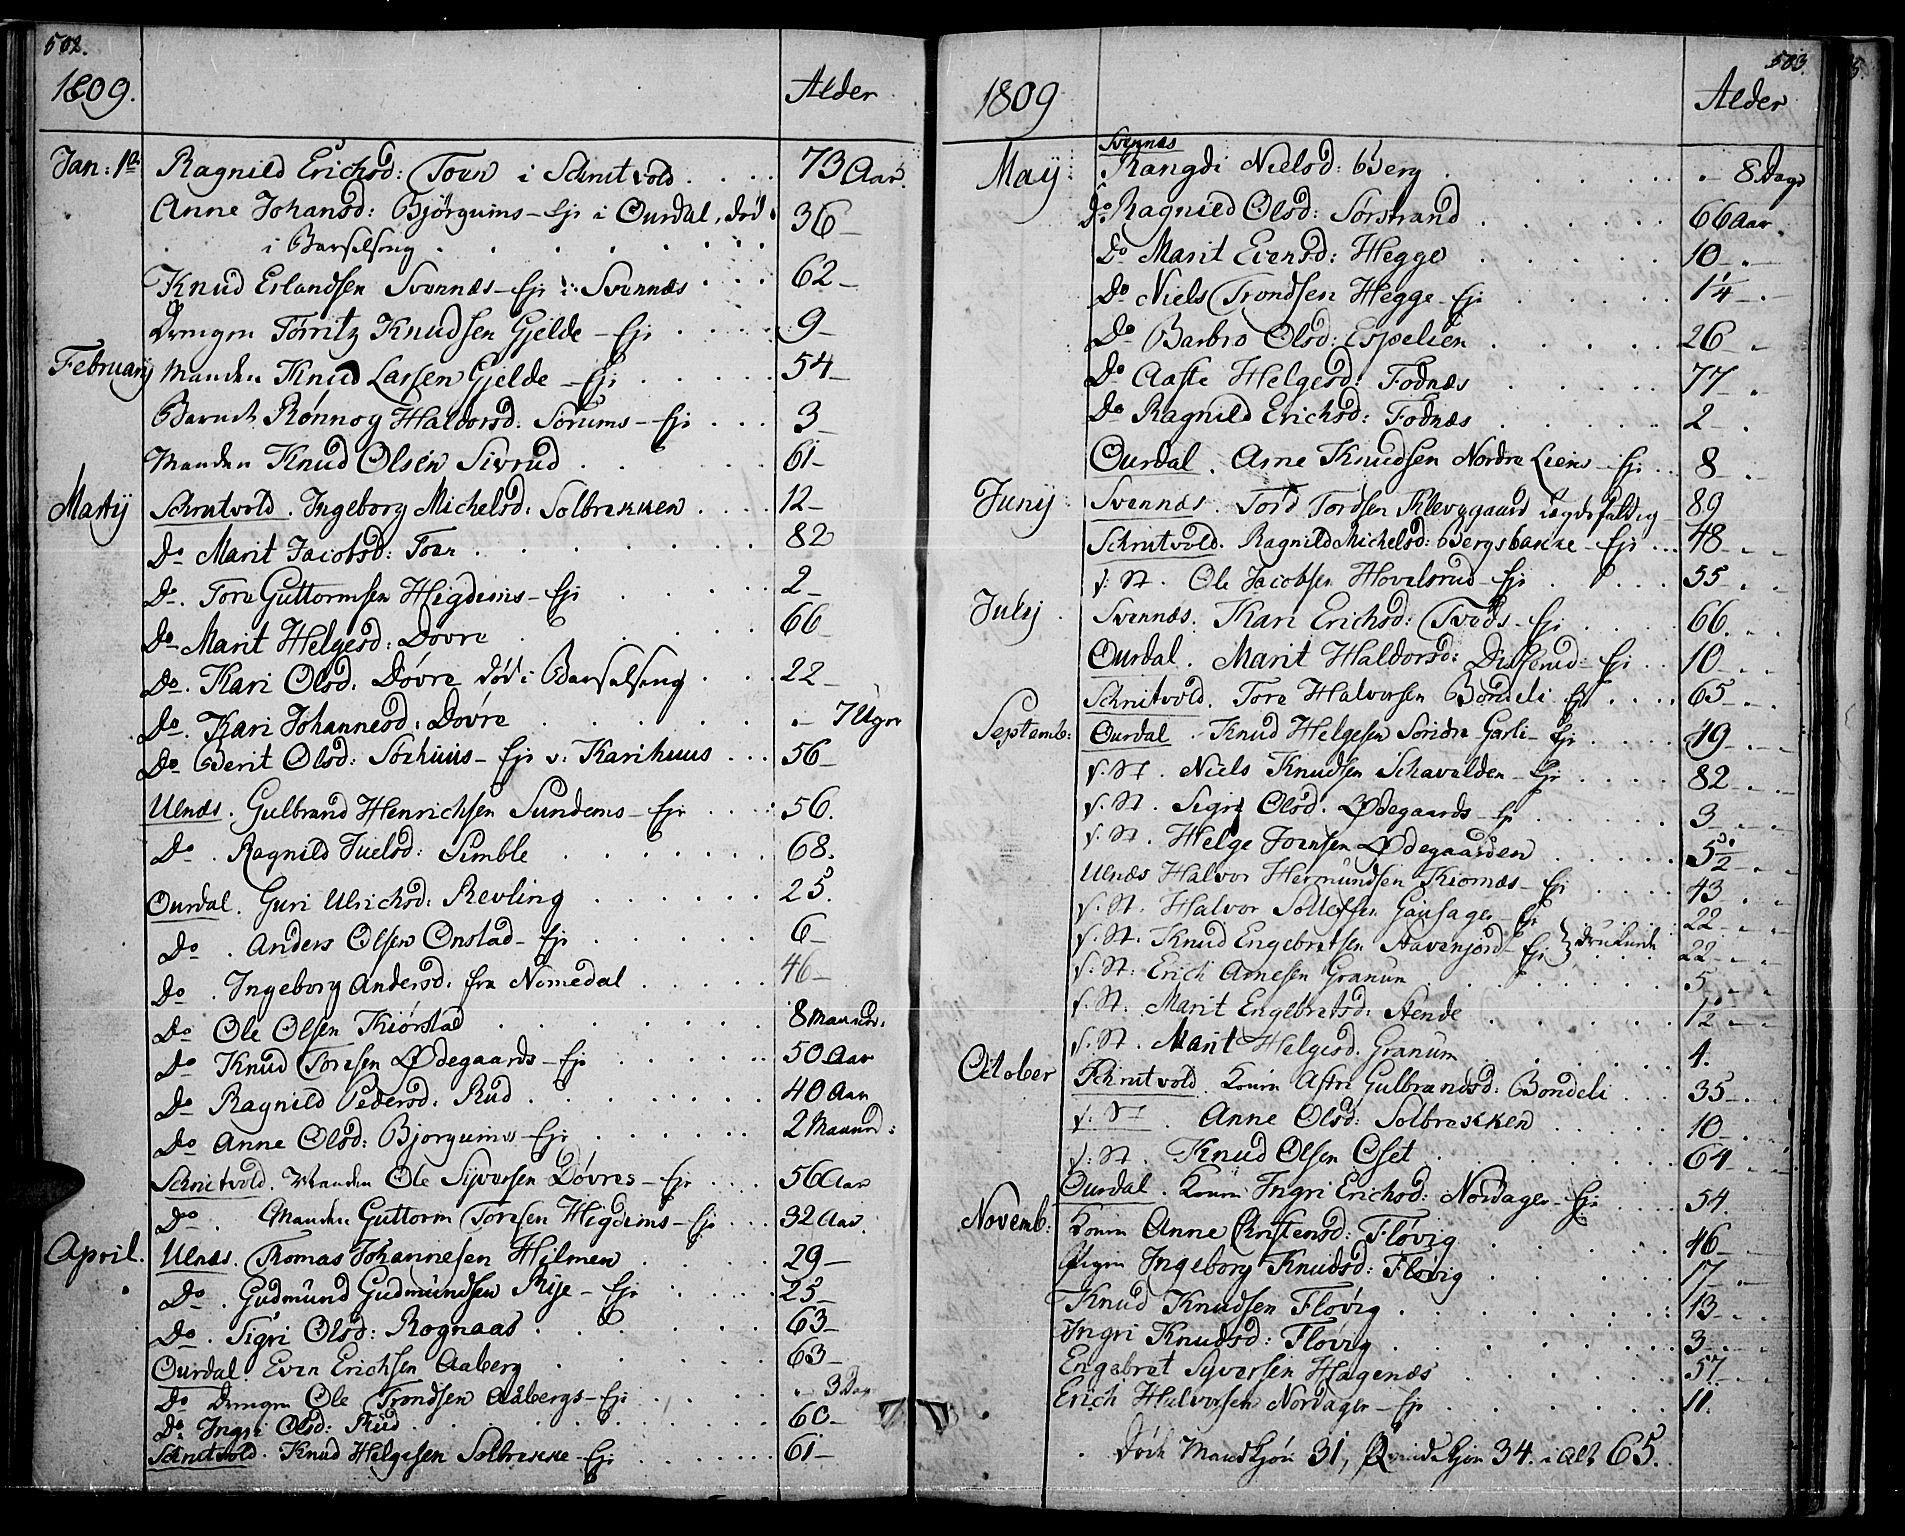 SAH, Nord-Aurdal prestekontor, Ministerialbok nr. 1, 1808-1815, s. 502-503